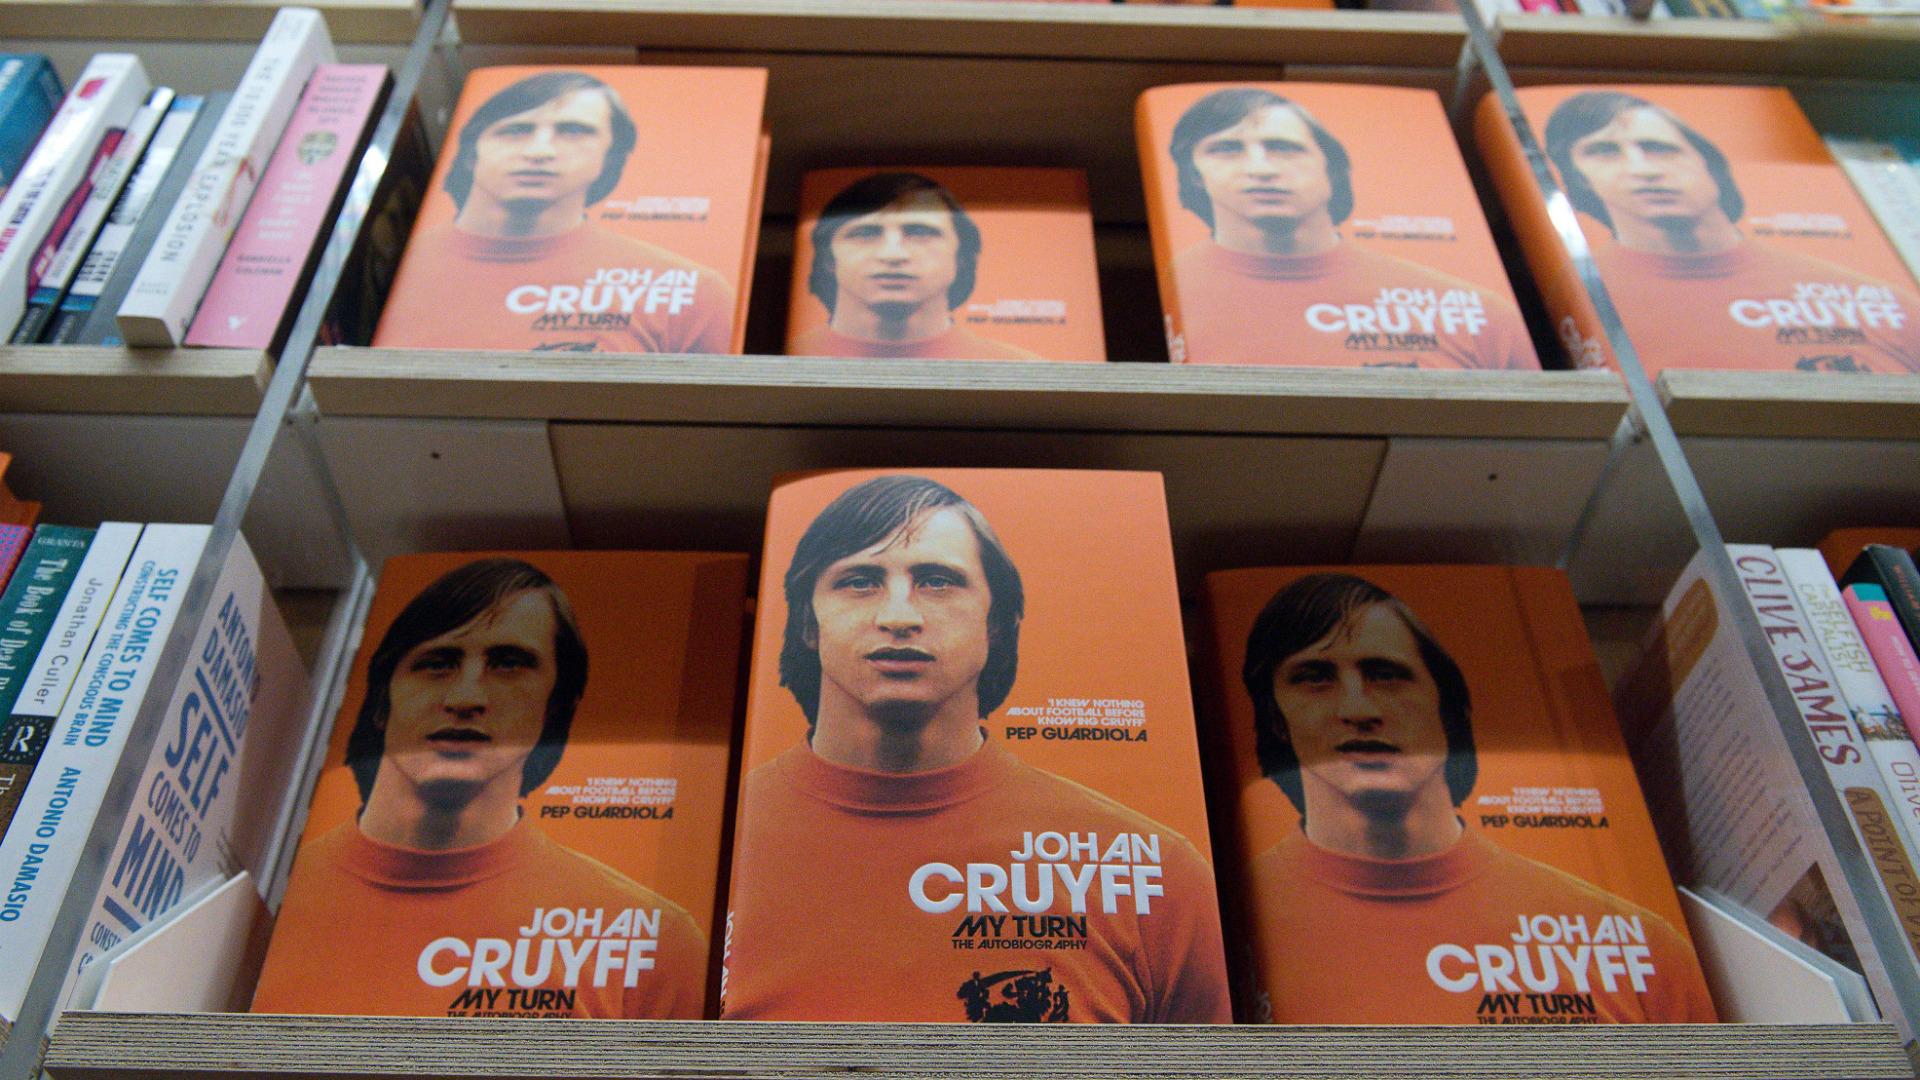 Cruyff biography